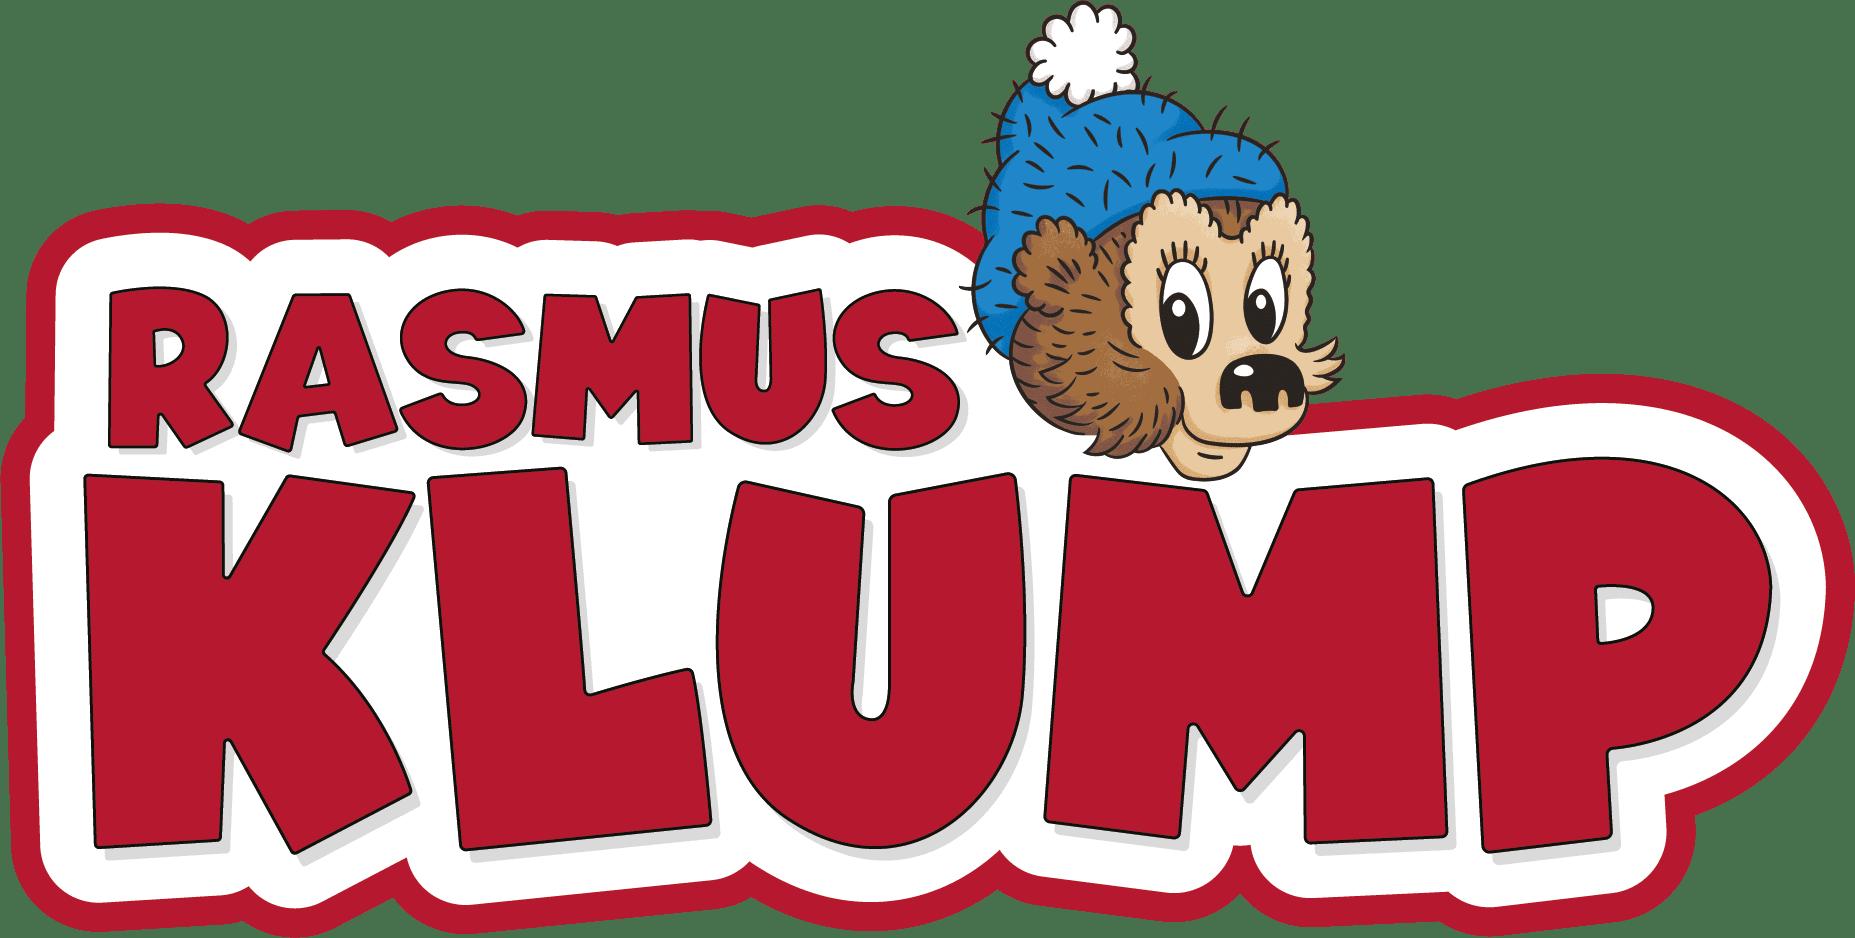 Rasmus Klump show